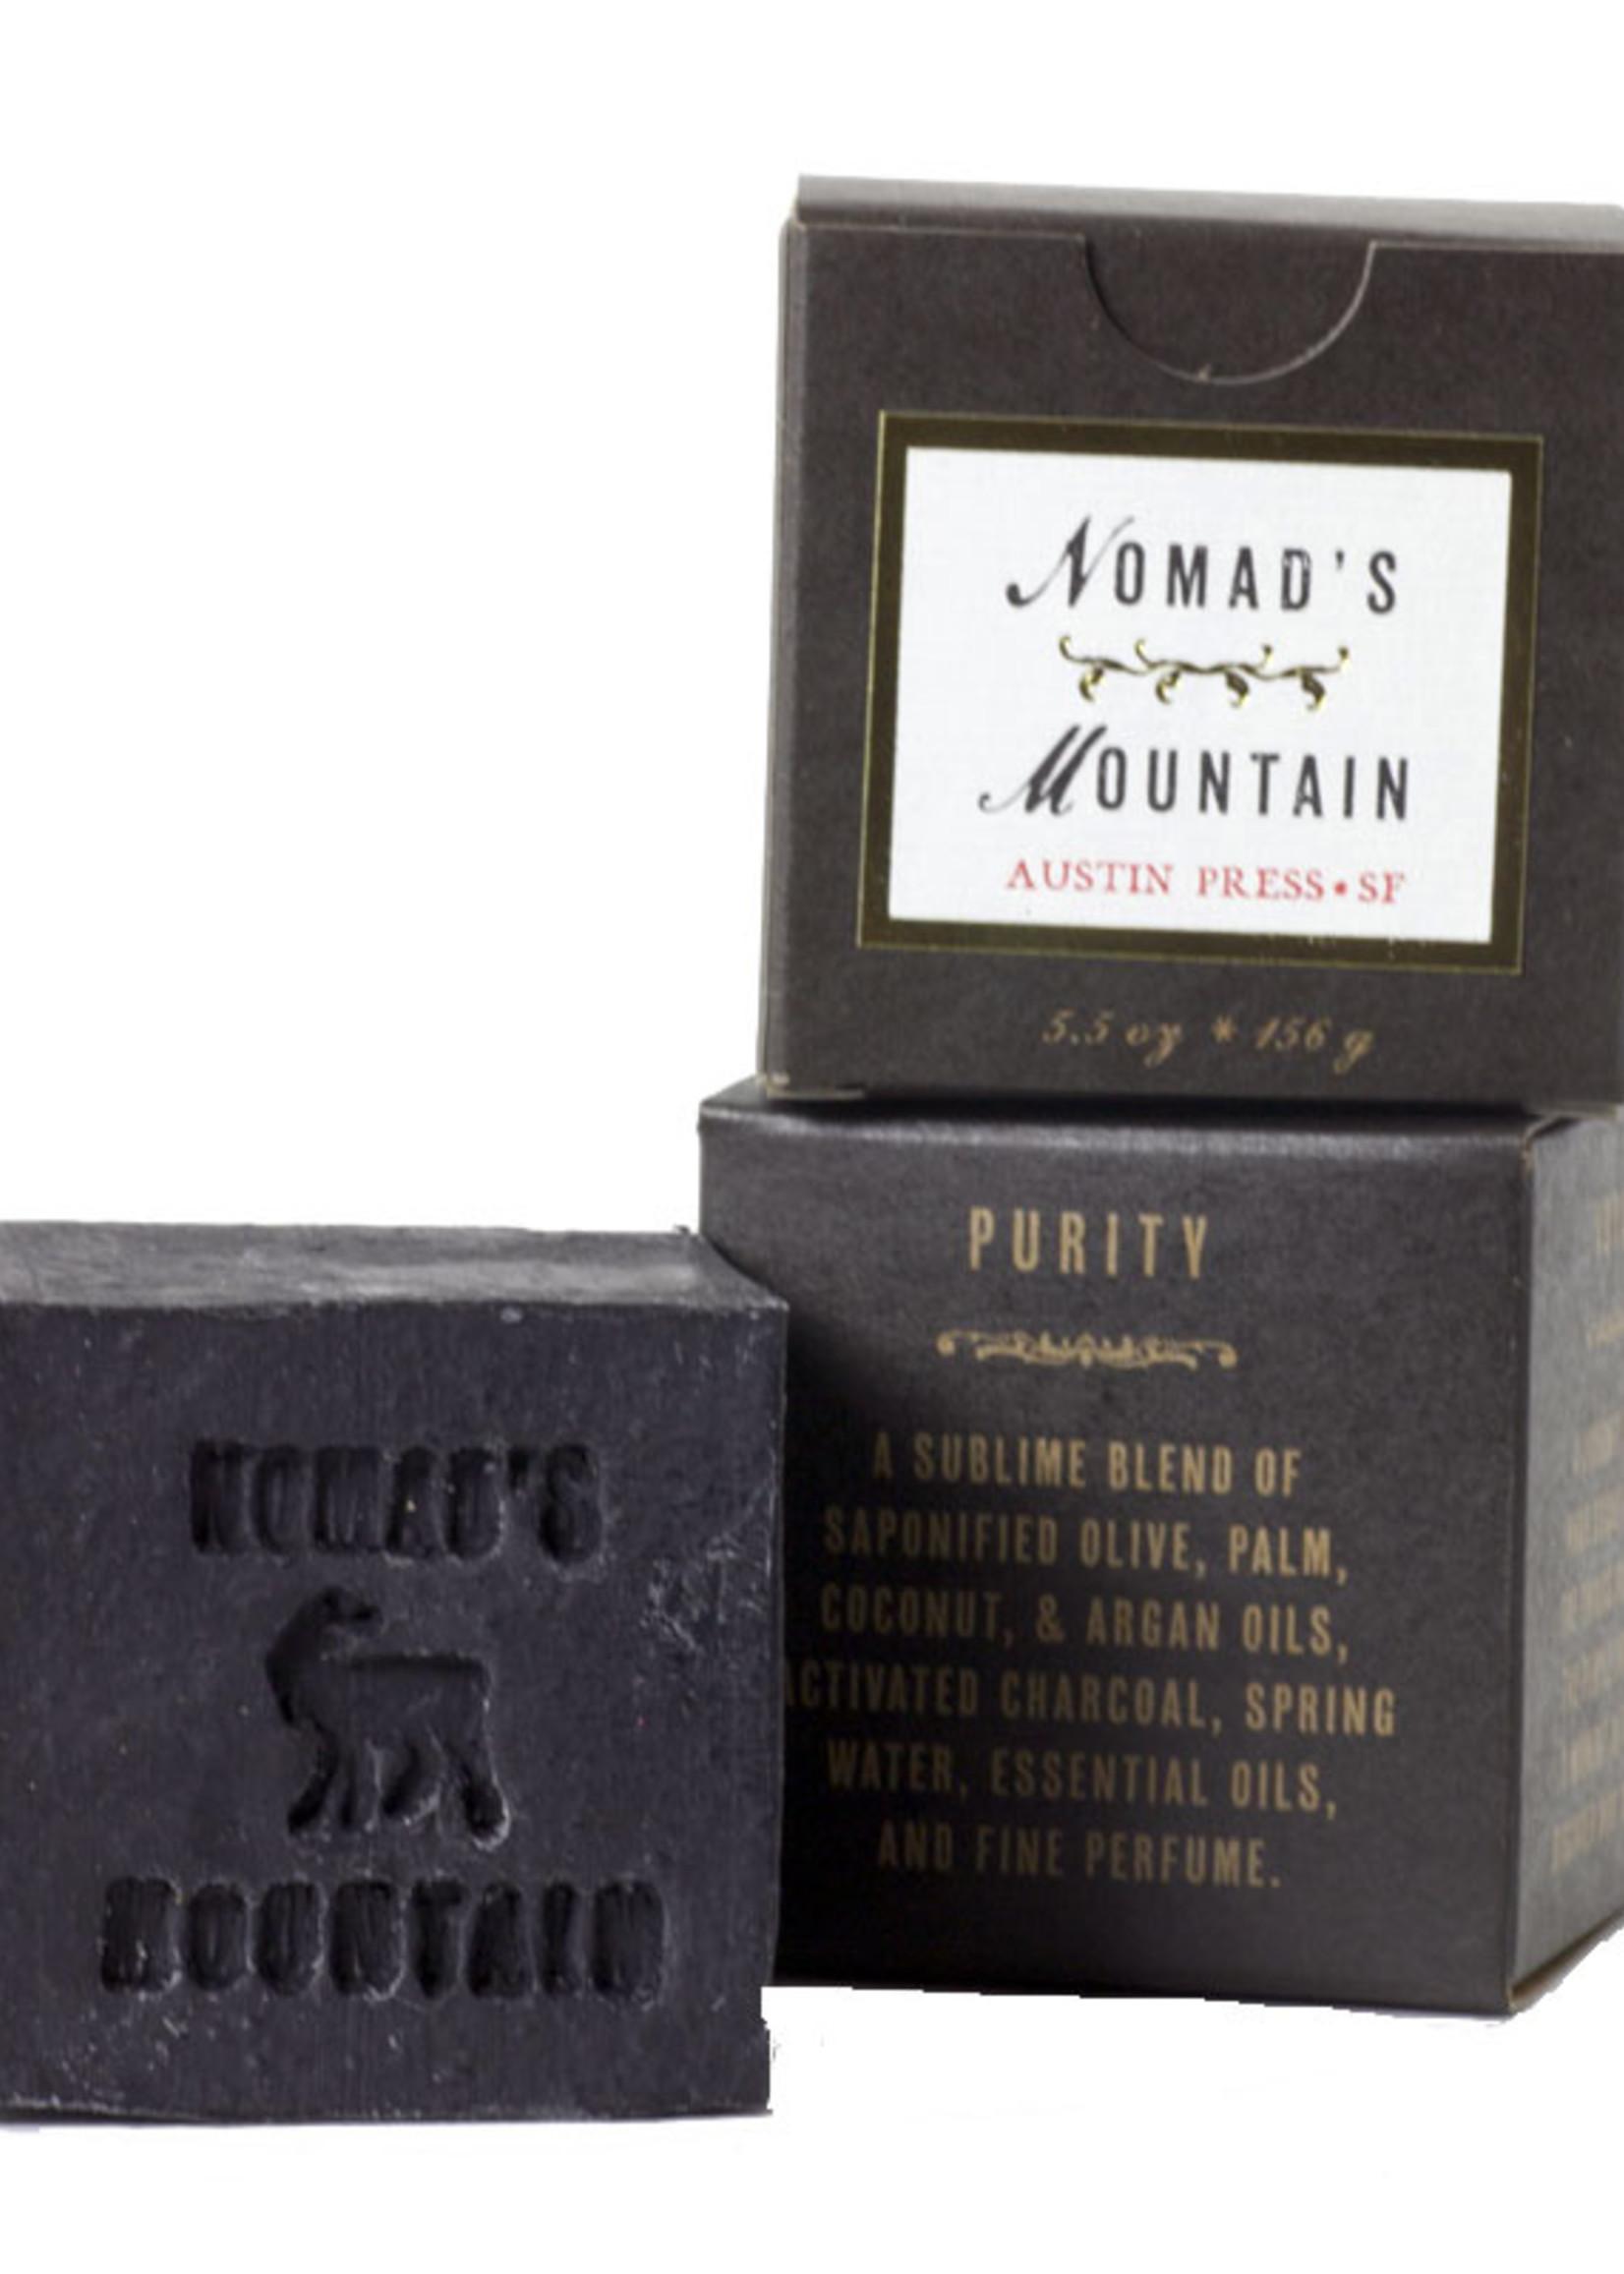 Austin Press Nomad's Mountain Soap